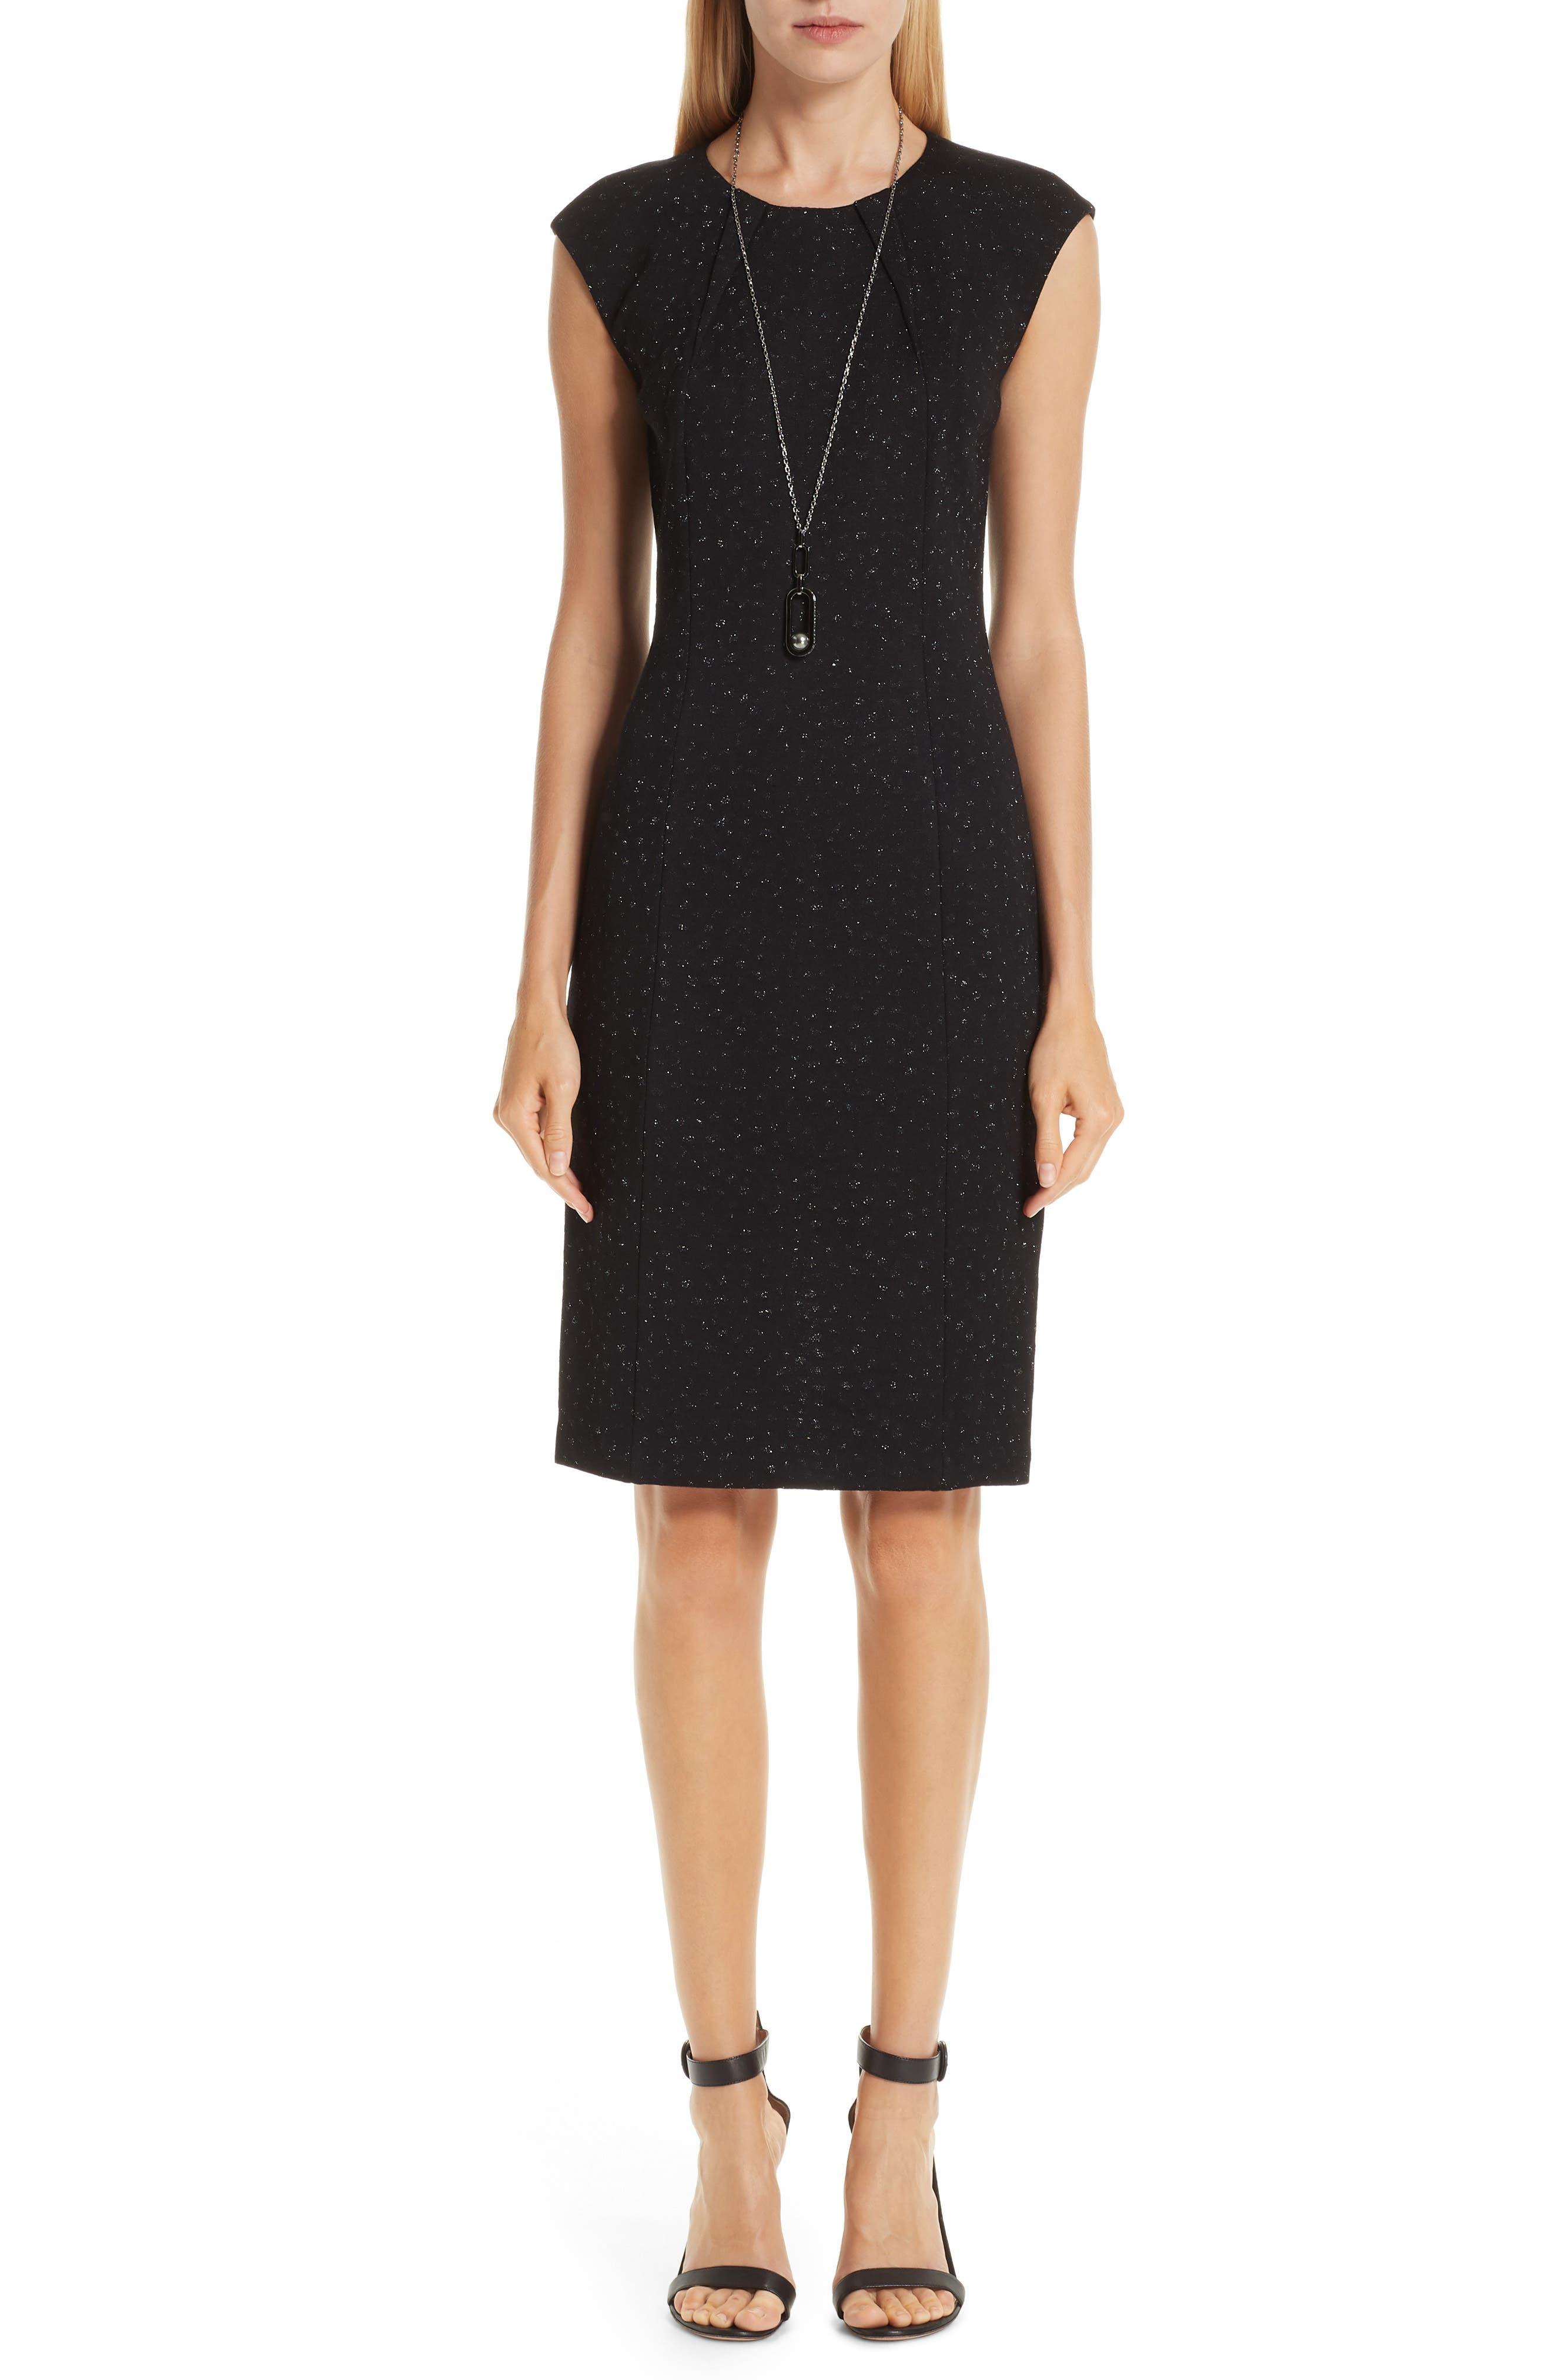 St. John Collection Blister Knit Metallic Jacquard Dress, Black